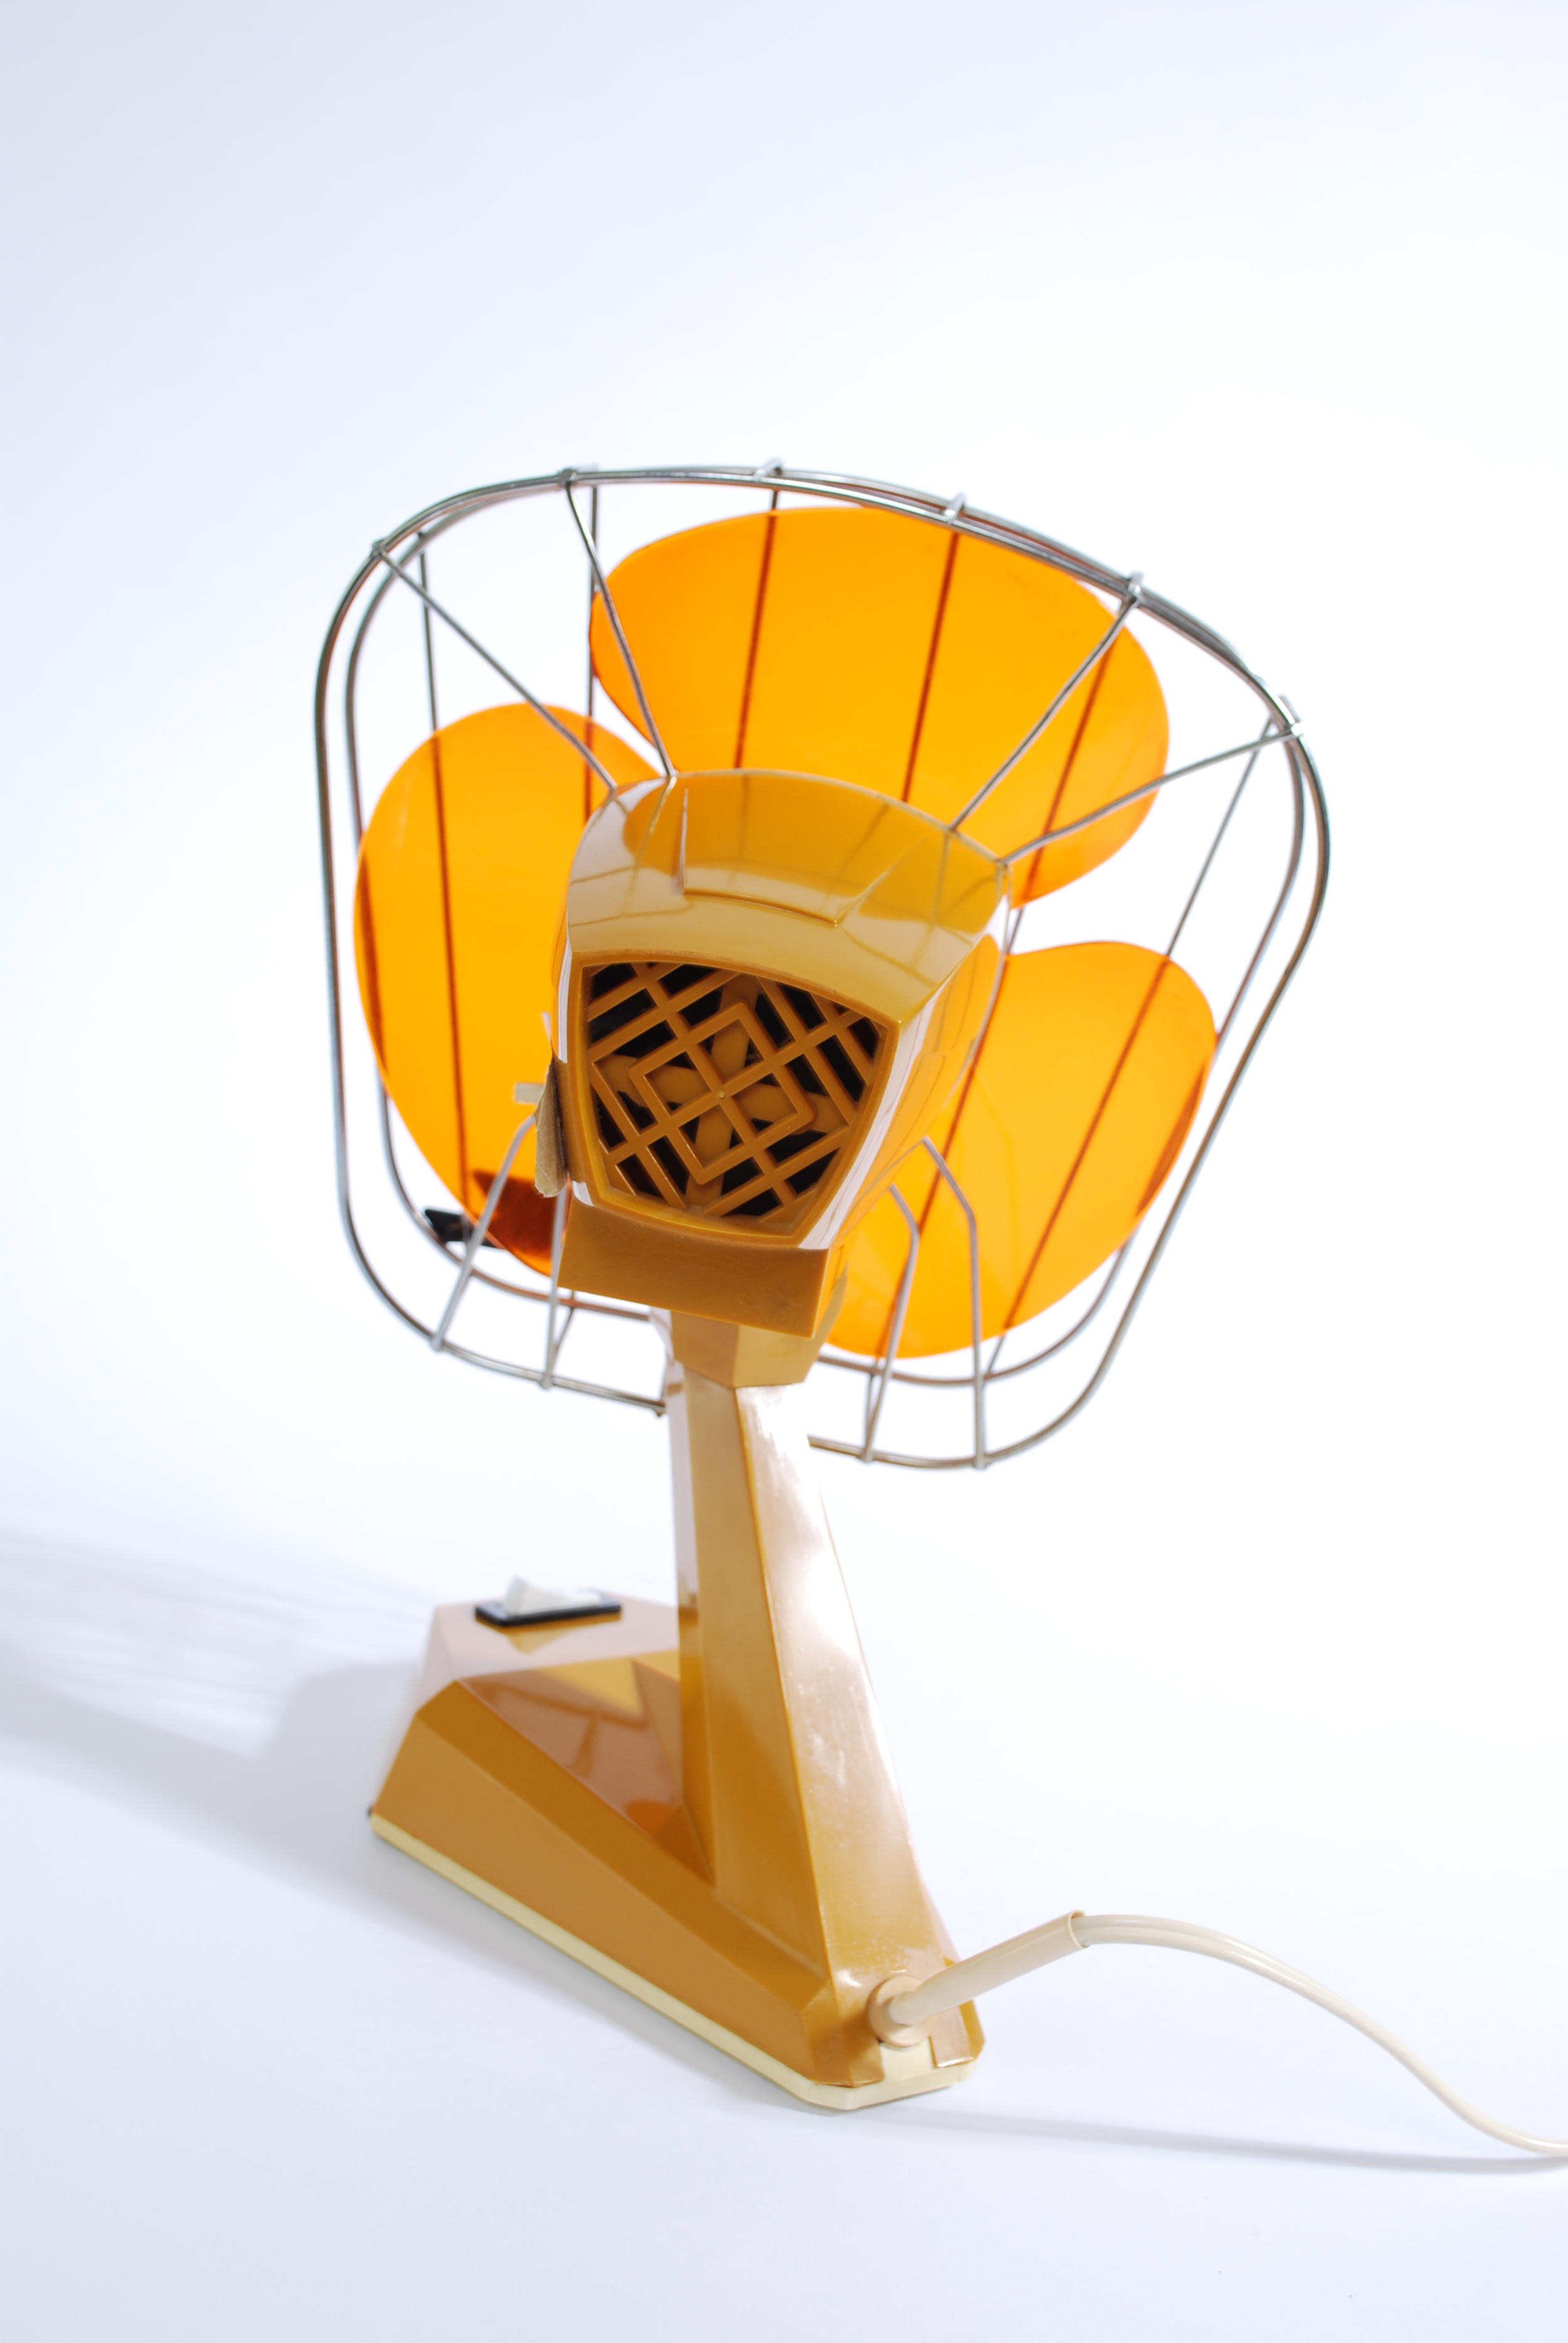 Ventilator AEPI, 70's, Italy